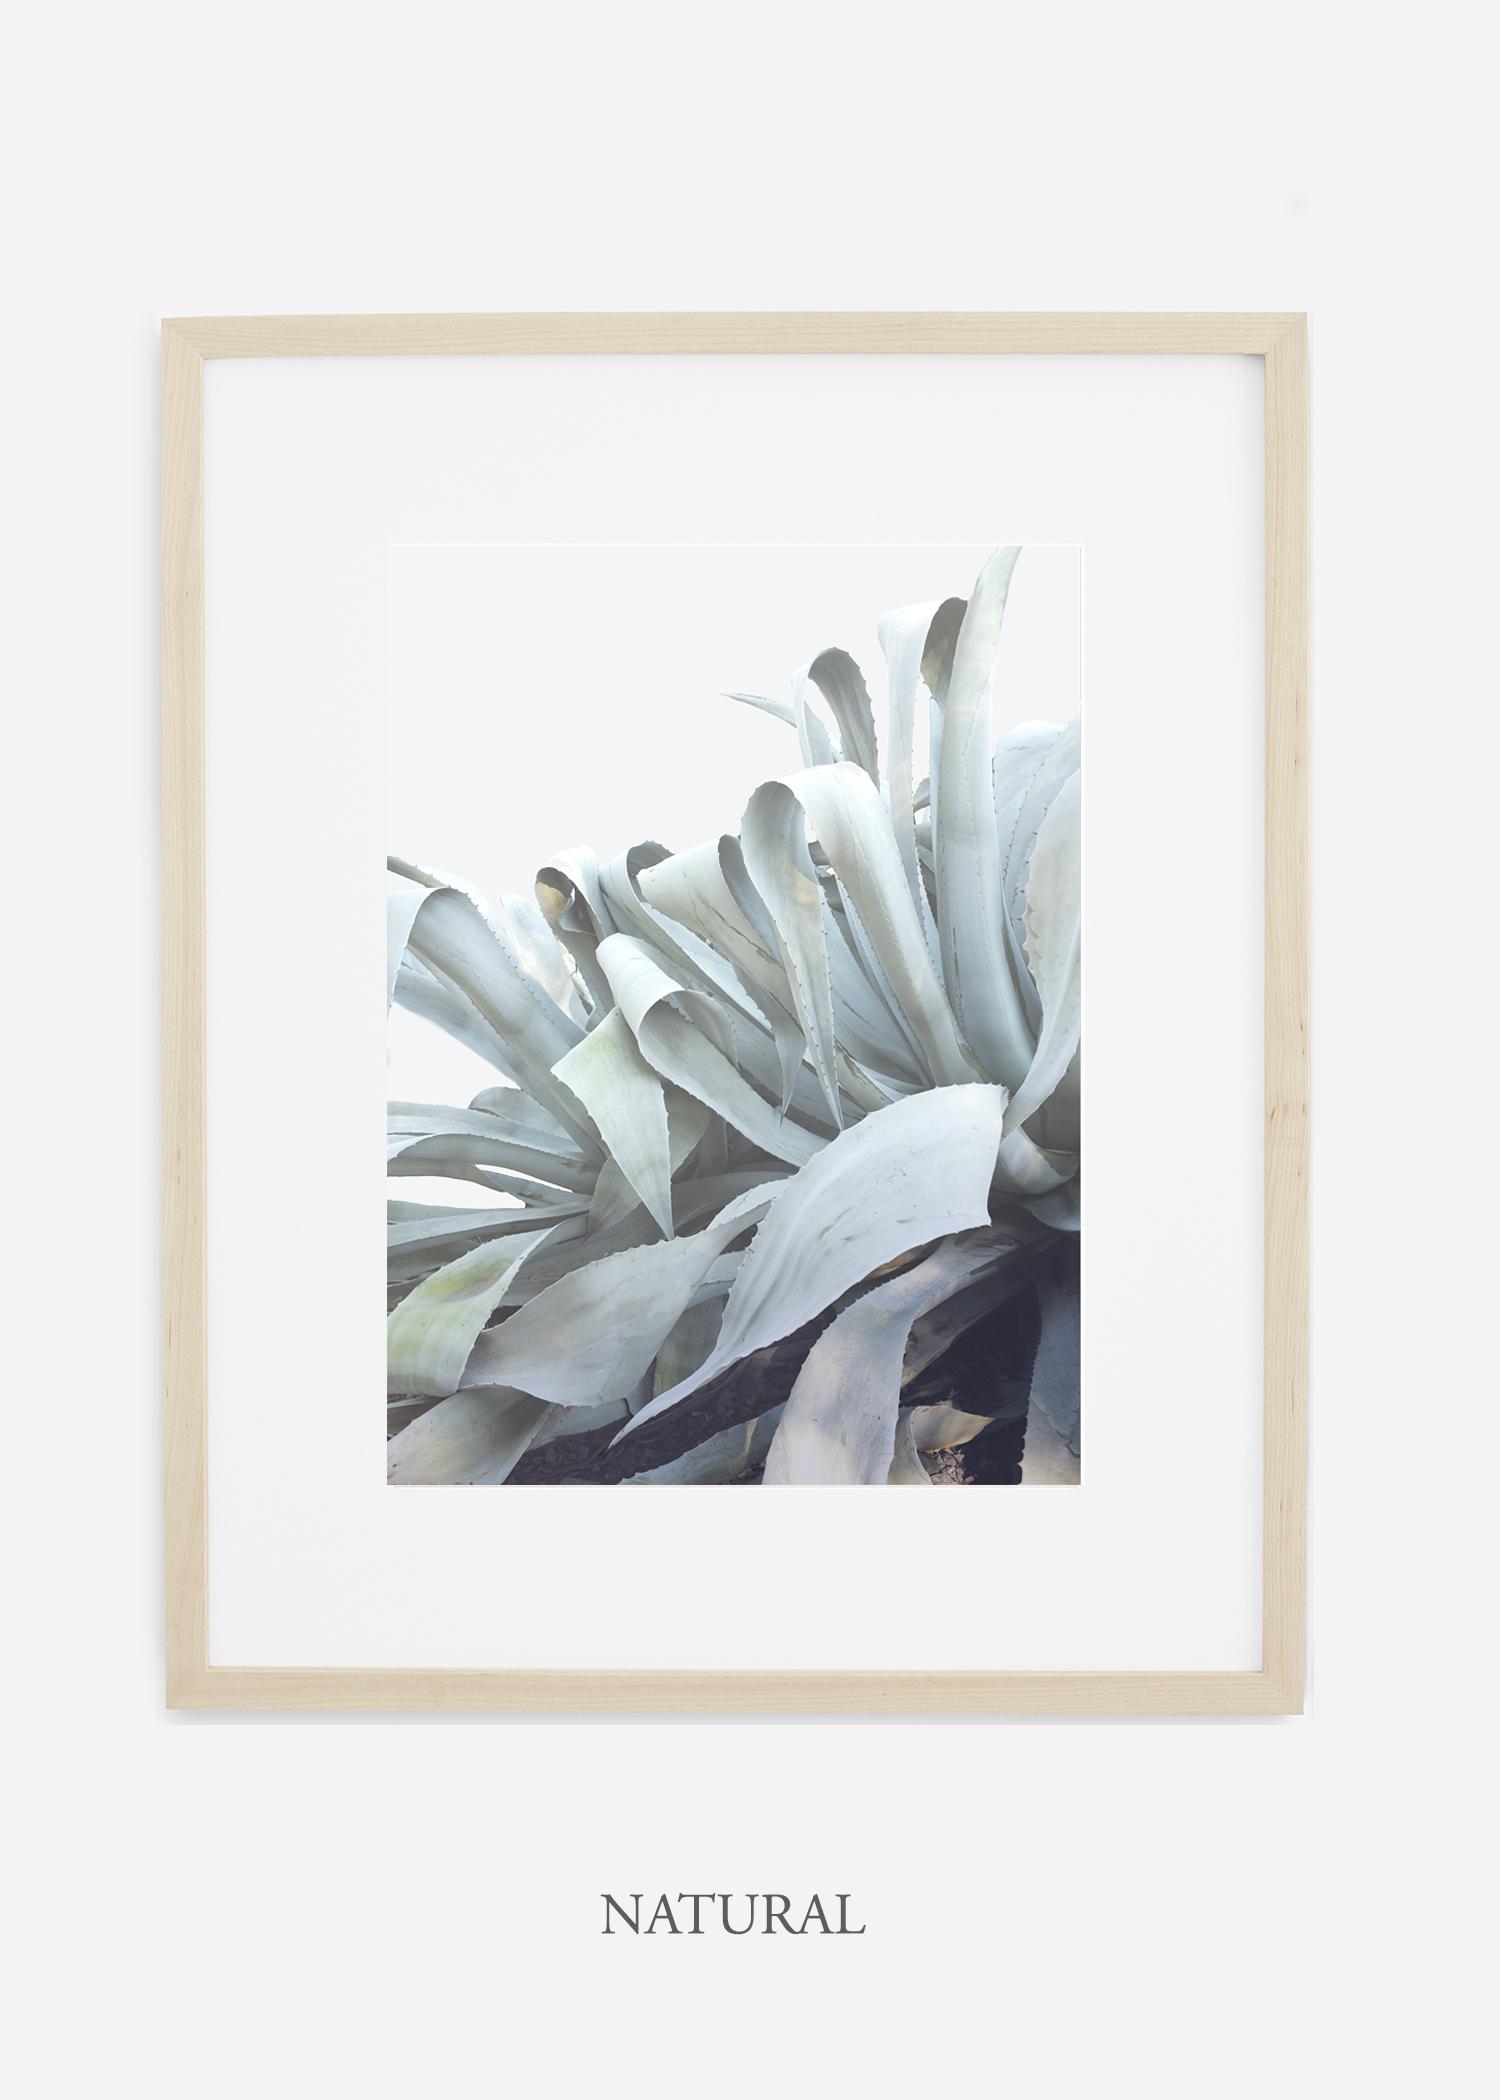 wildercalifornia_naturalframe_WinterWhite_AgaveNo.2_Desert_LosAngeles_Art_HomeDecor_interiordesign_design.jpg